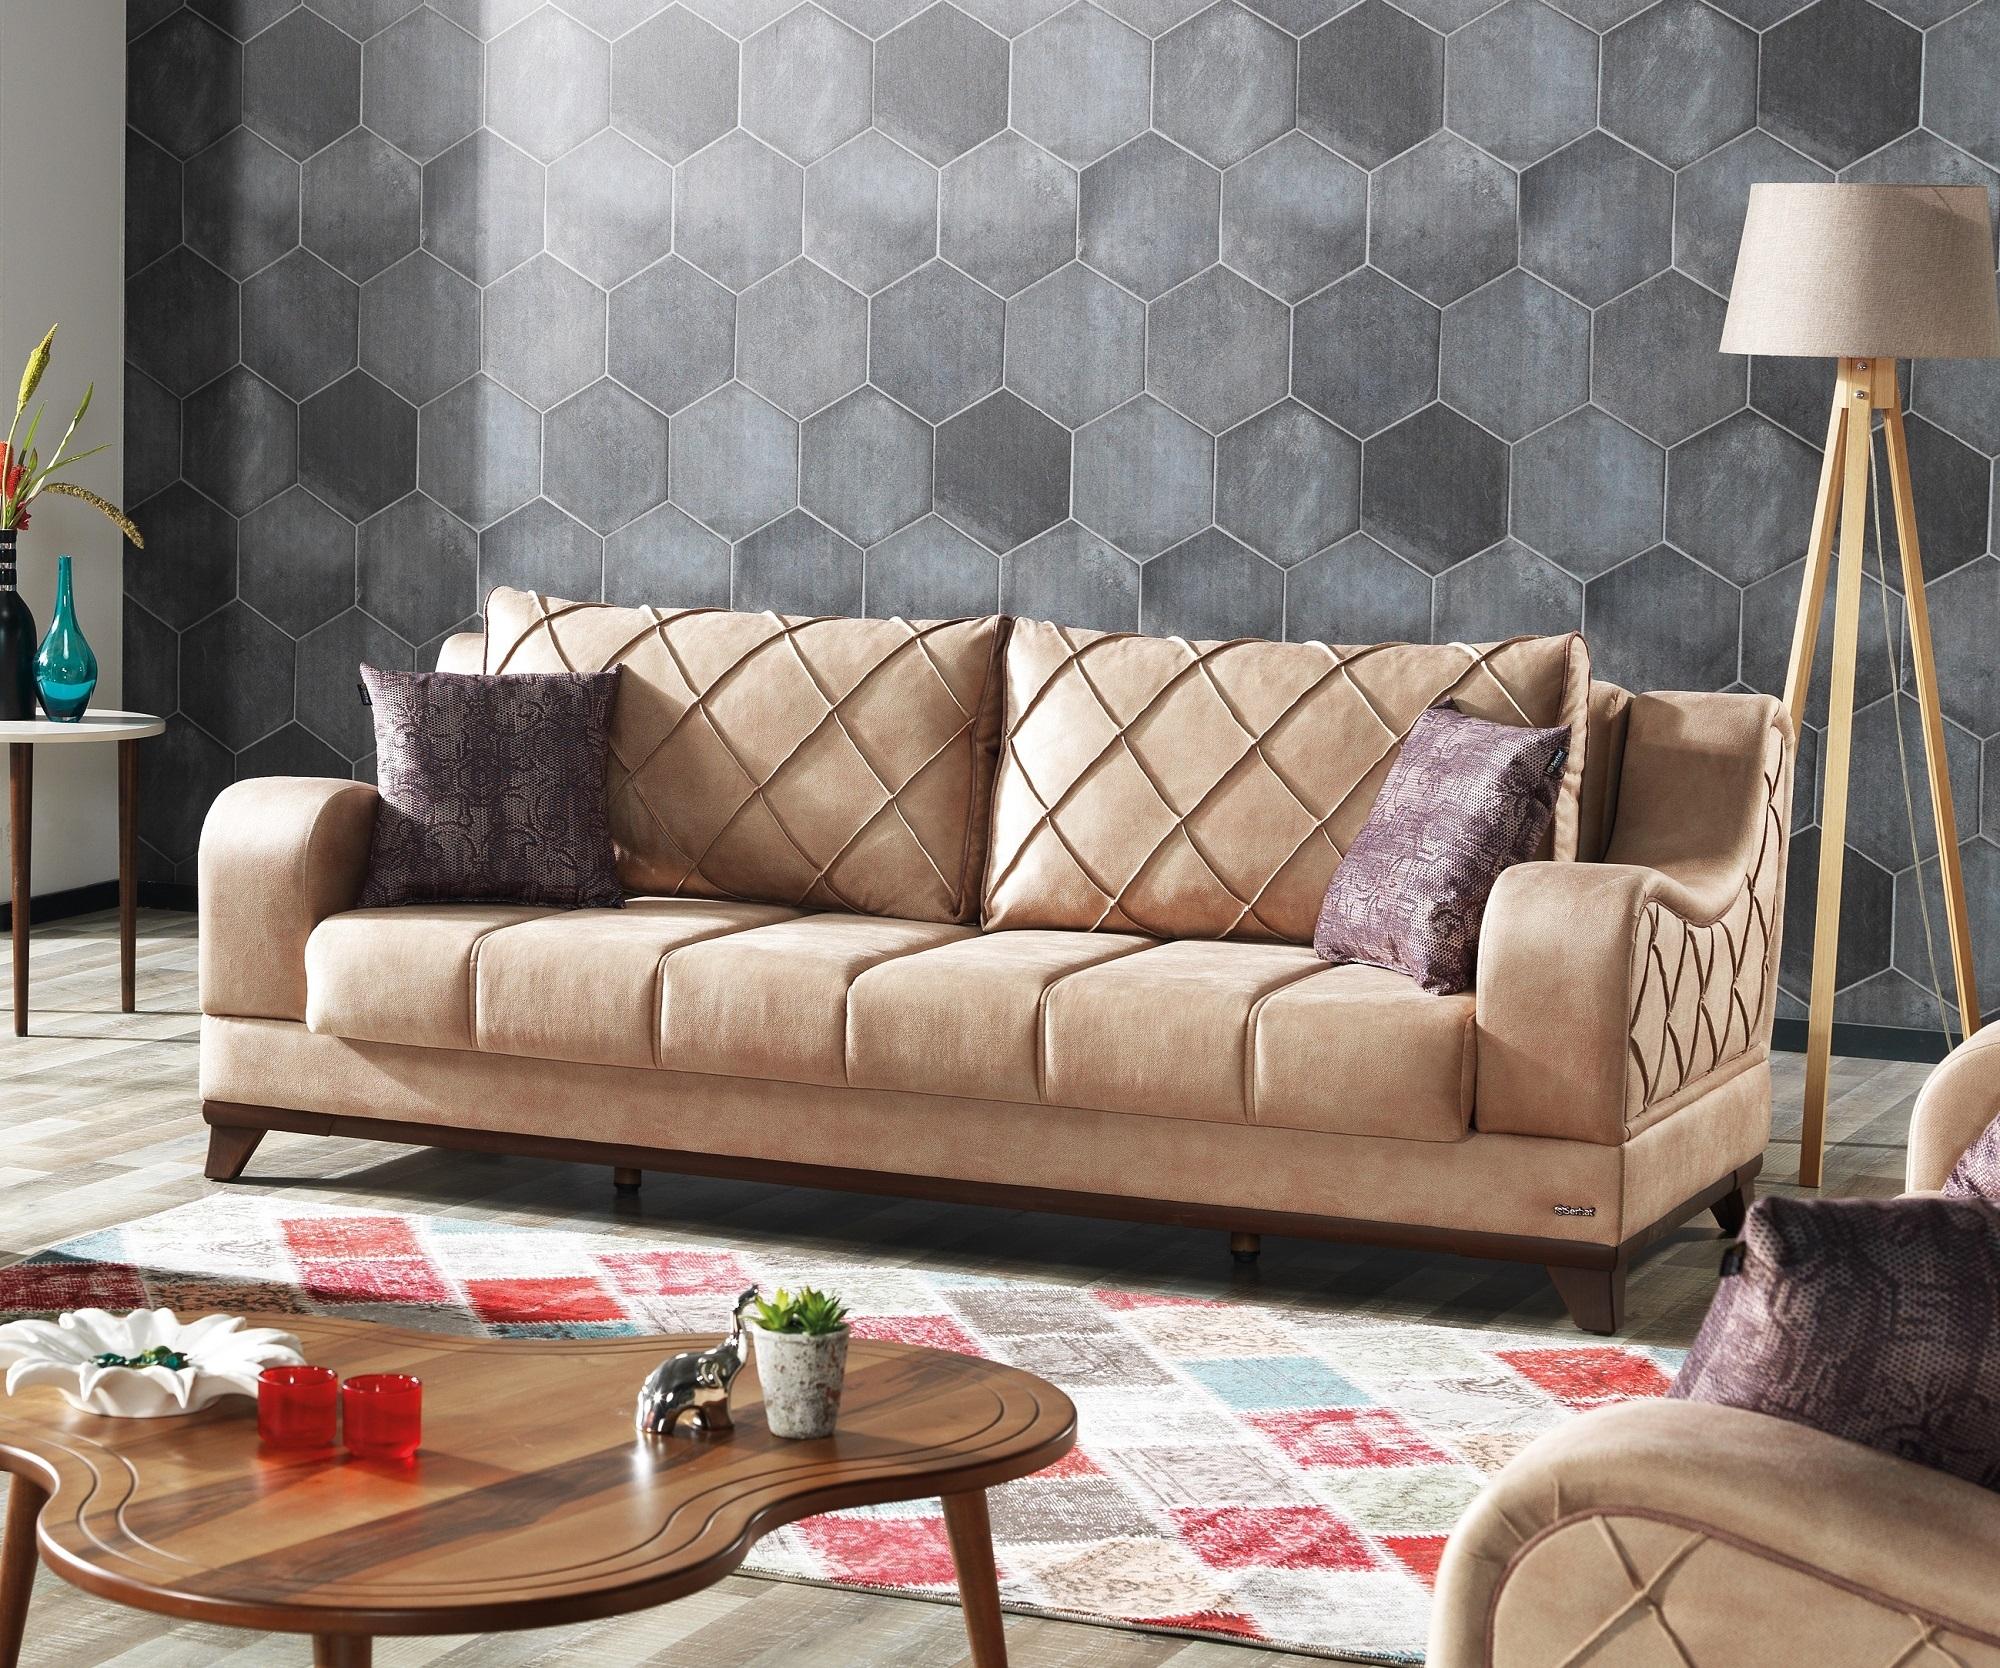 Canapea extensibila tapitata cu stofa, 3 locuri Woody Maro deschis K1, l225xA102xH82 cm